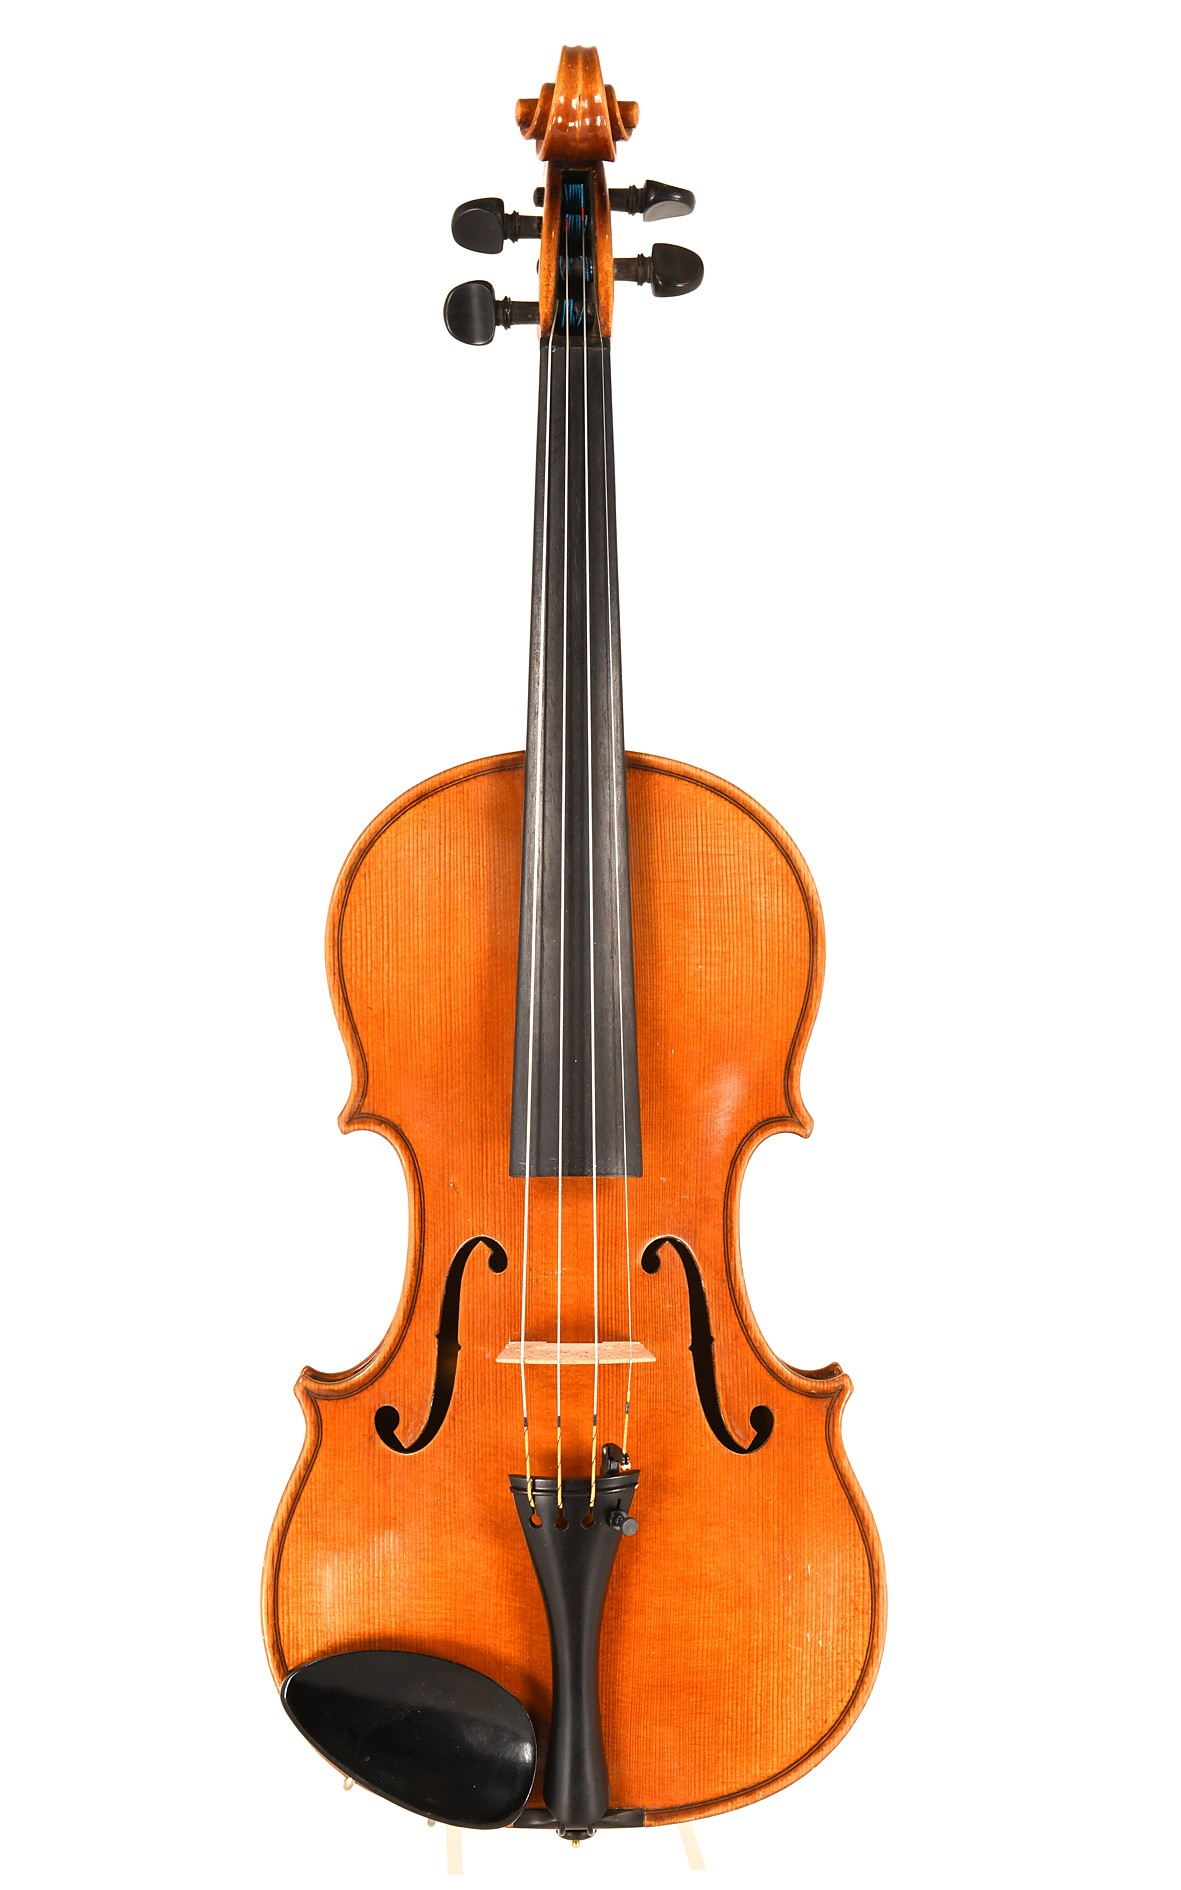 Violin by Werner Voigt